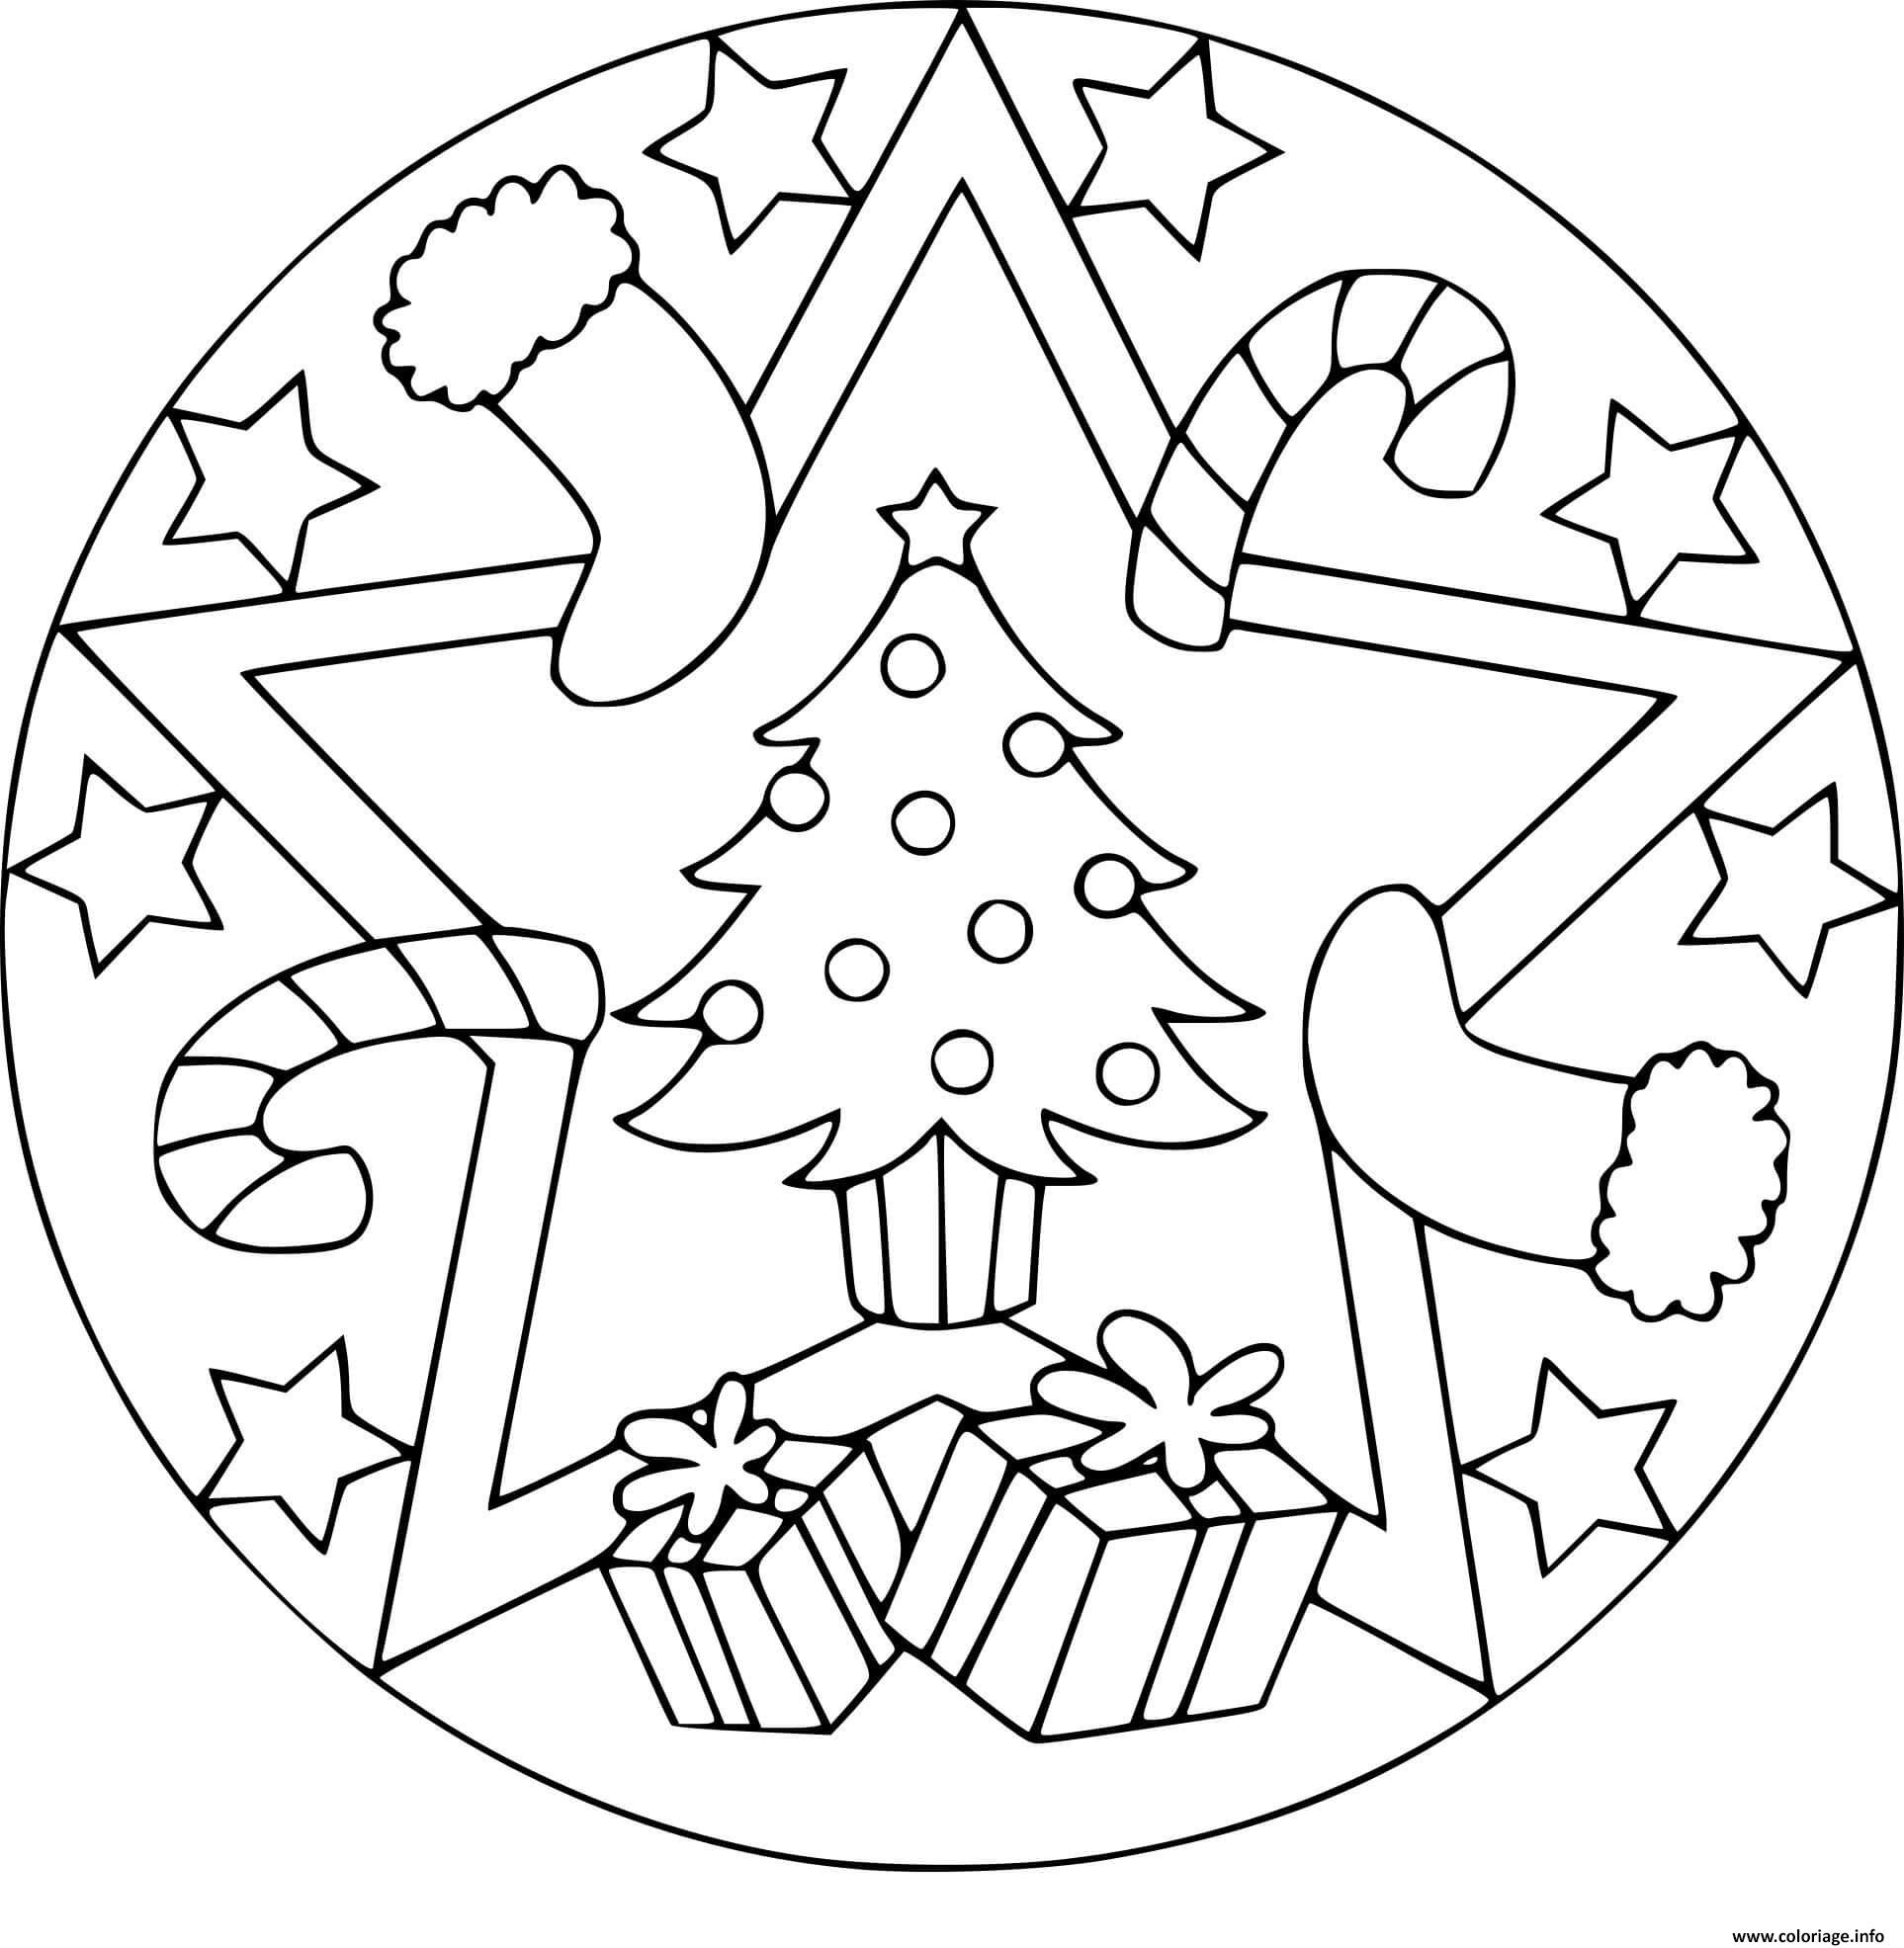 Coloriage Mandala Noel Sapin Cadeaux Jecoloriecom